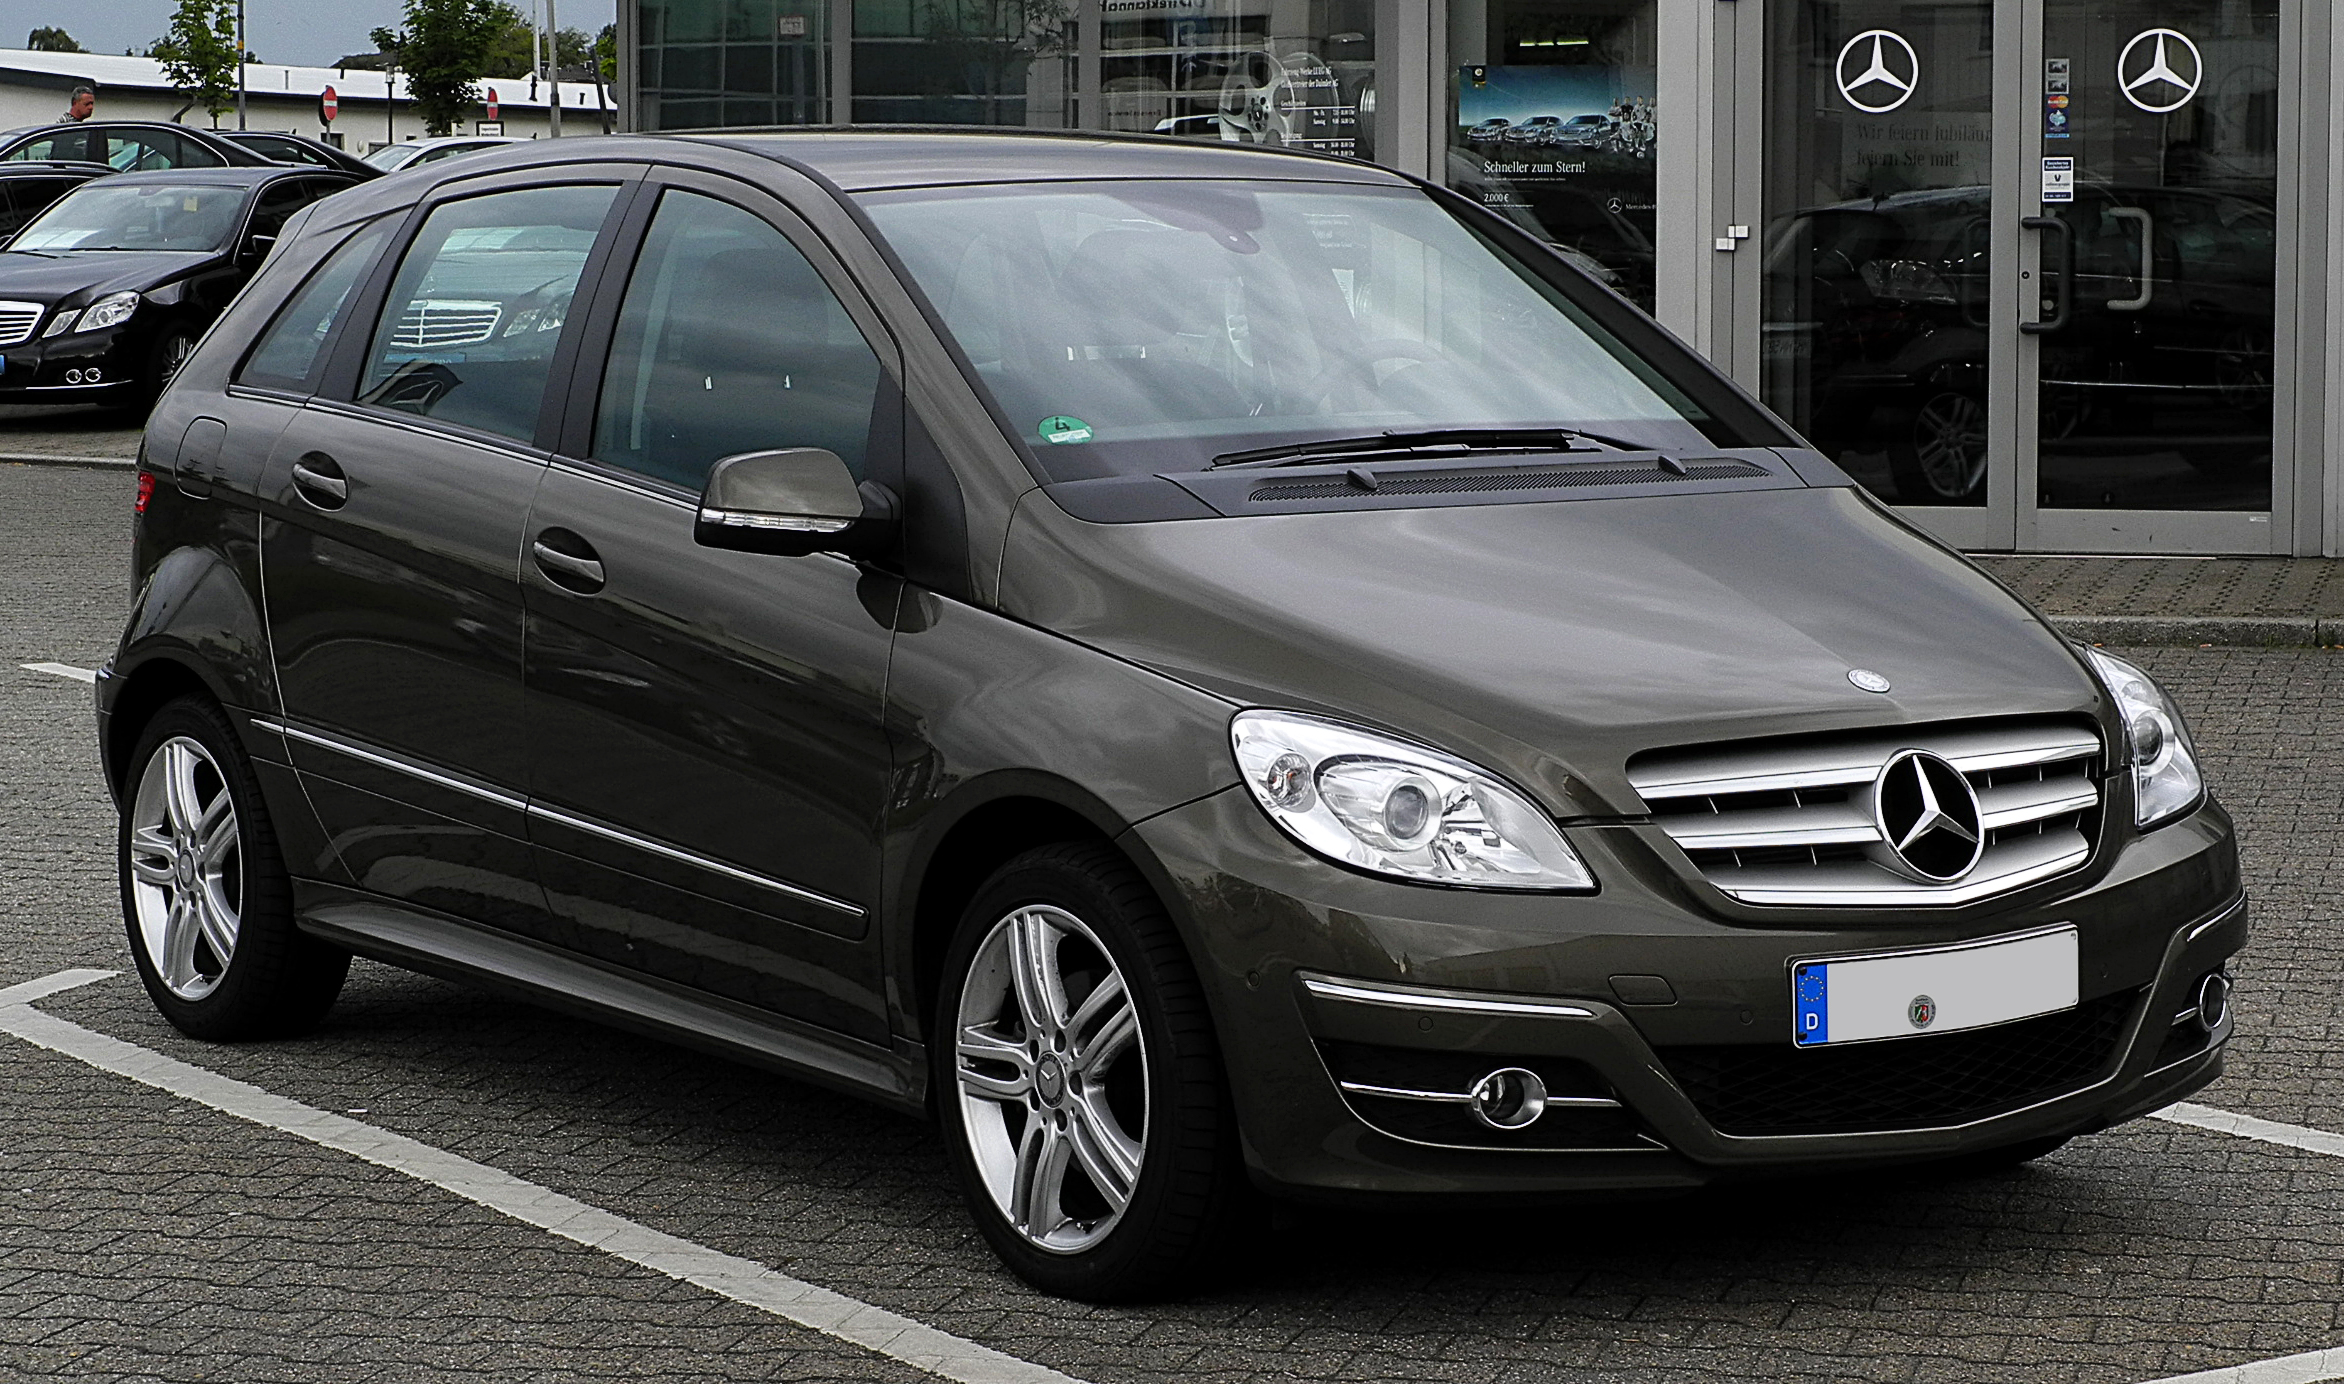 Mercedes benz b 180 cdi photos reviews news specs buy car for Buy my mercedes benz